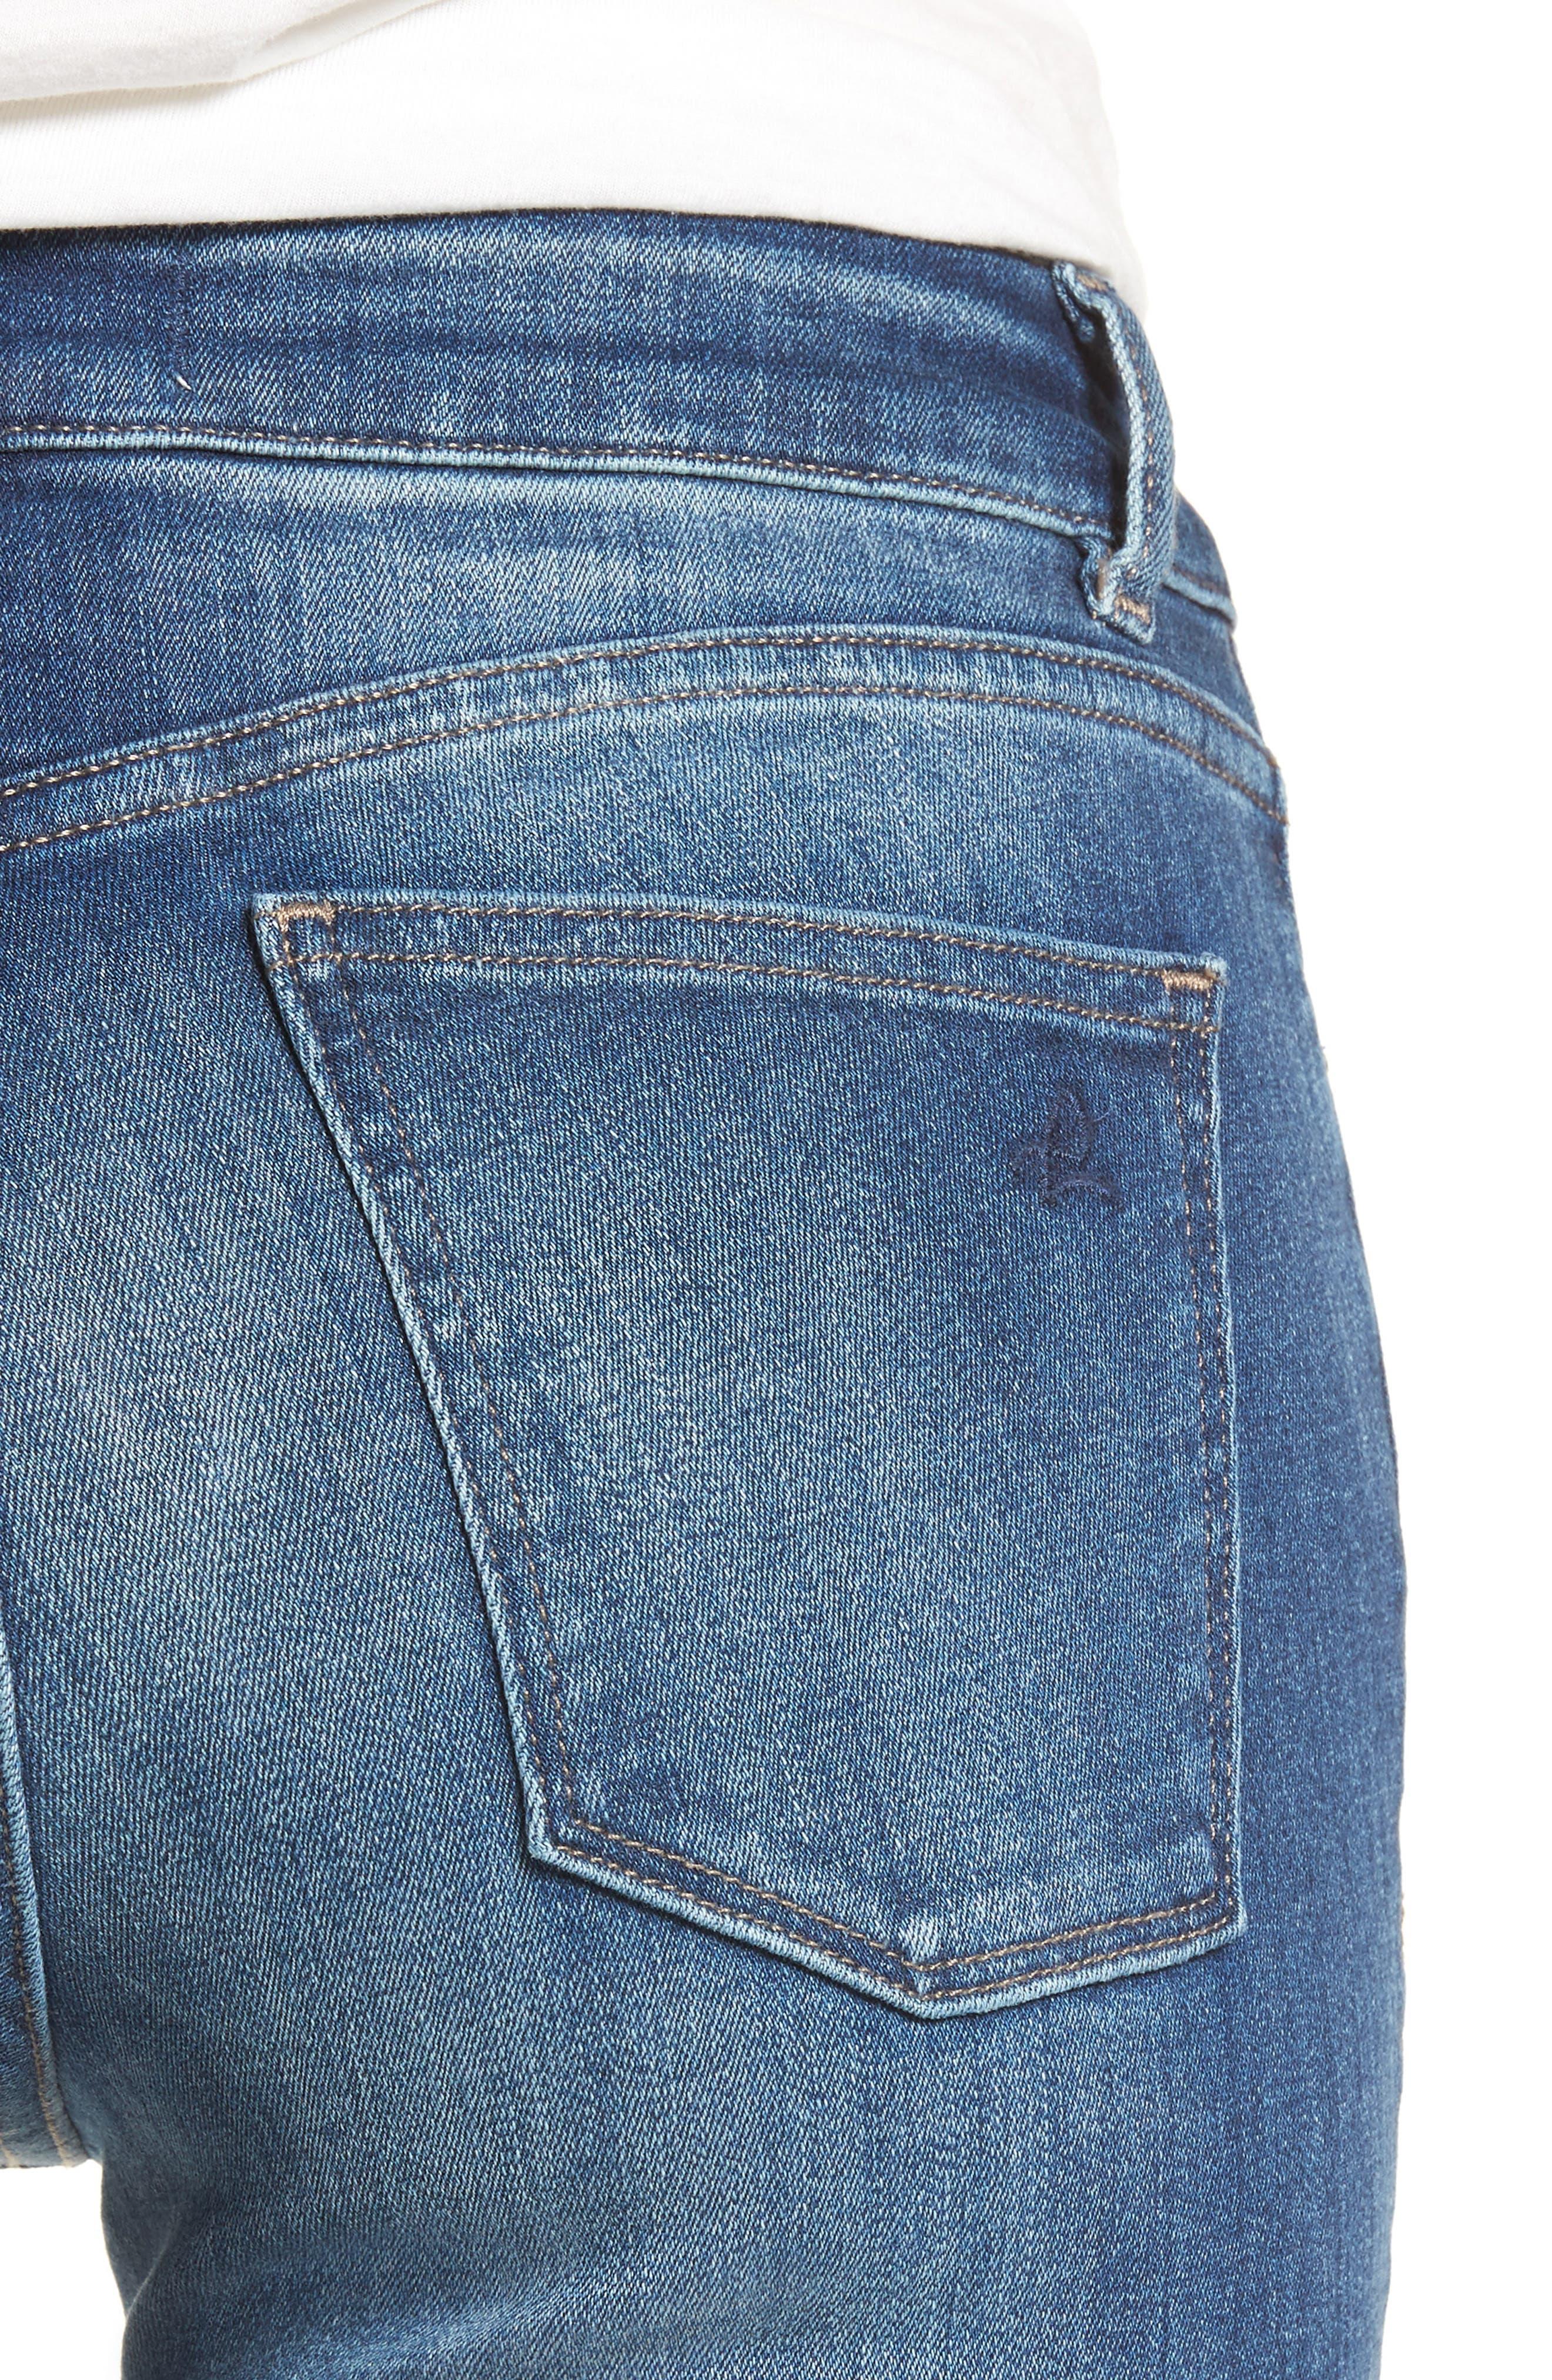 Mara Straight Leg Jeans,                             Alternate thumbnail 4, color,                             425